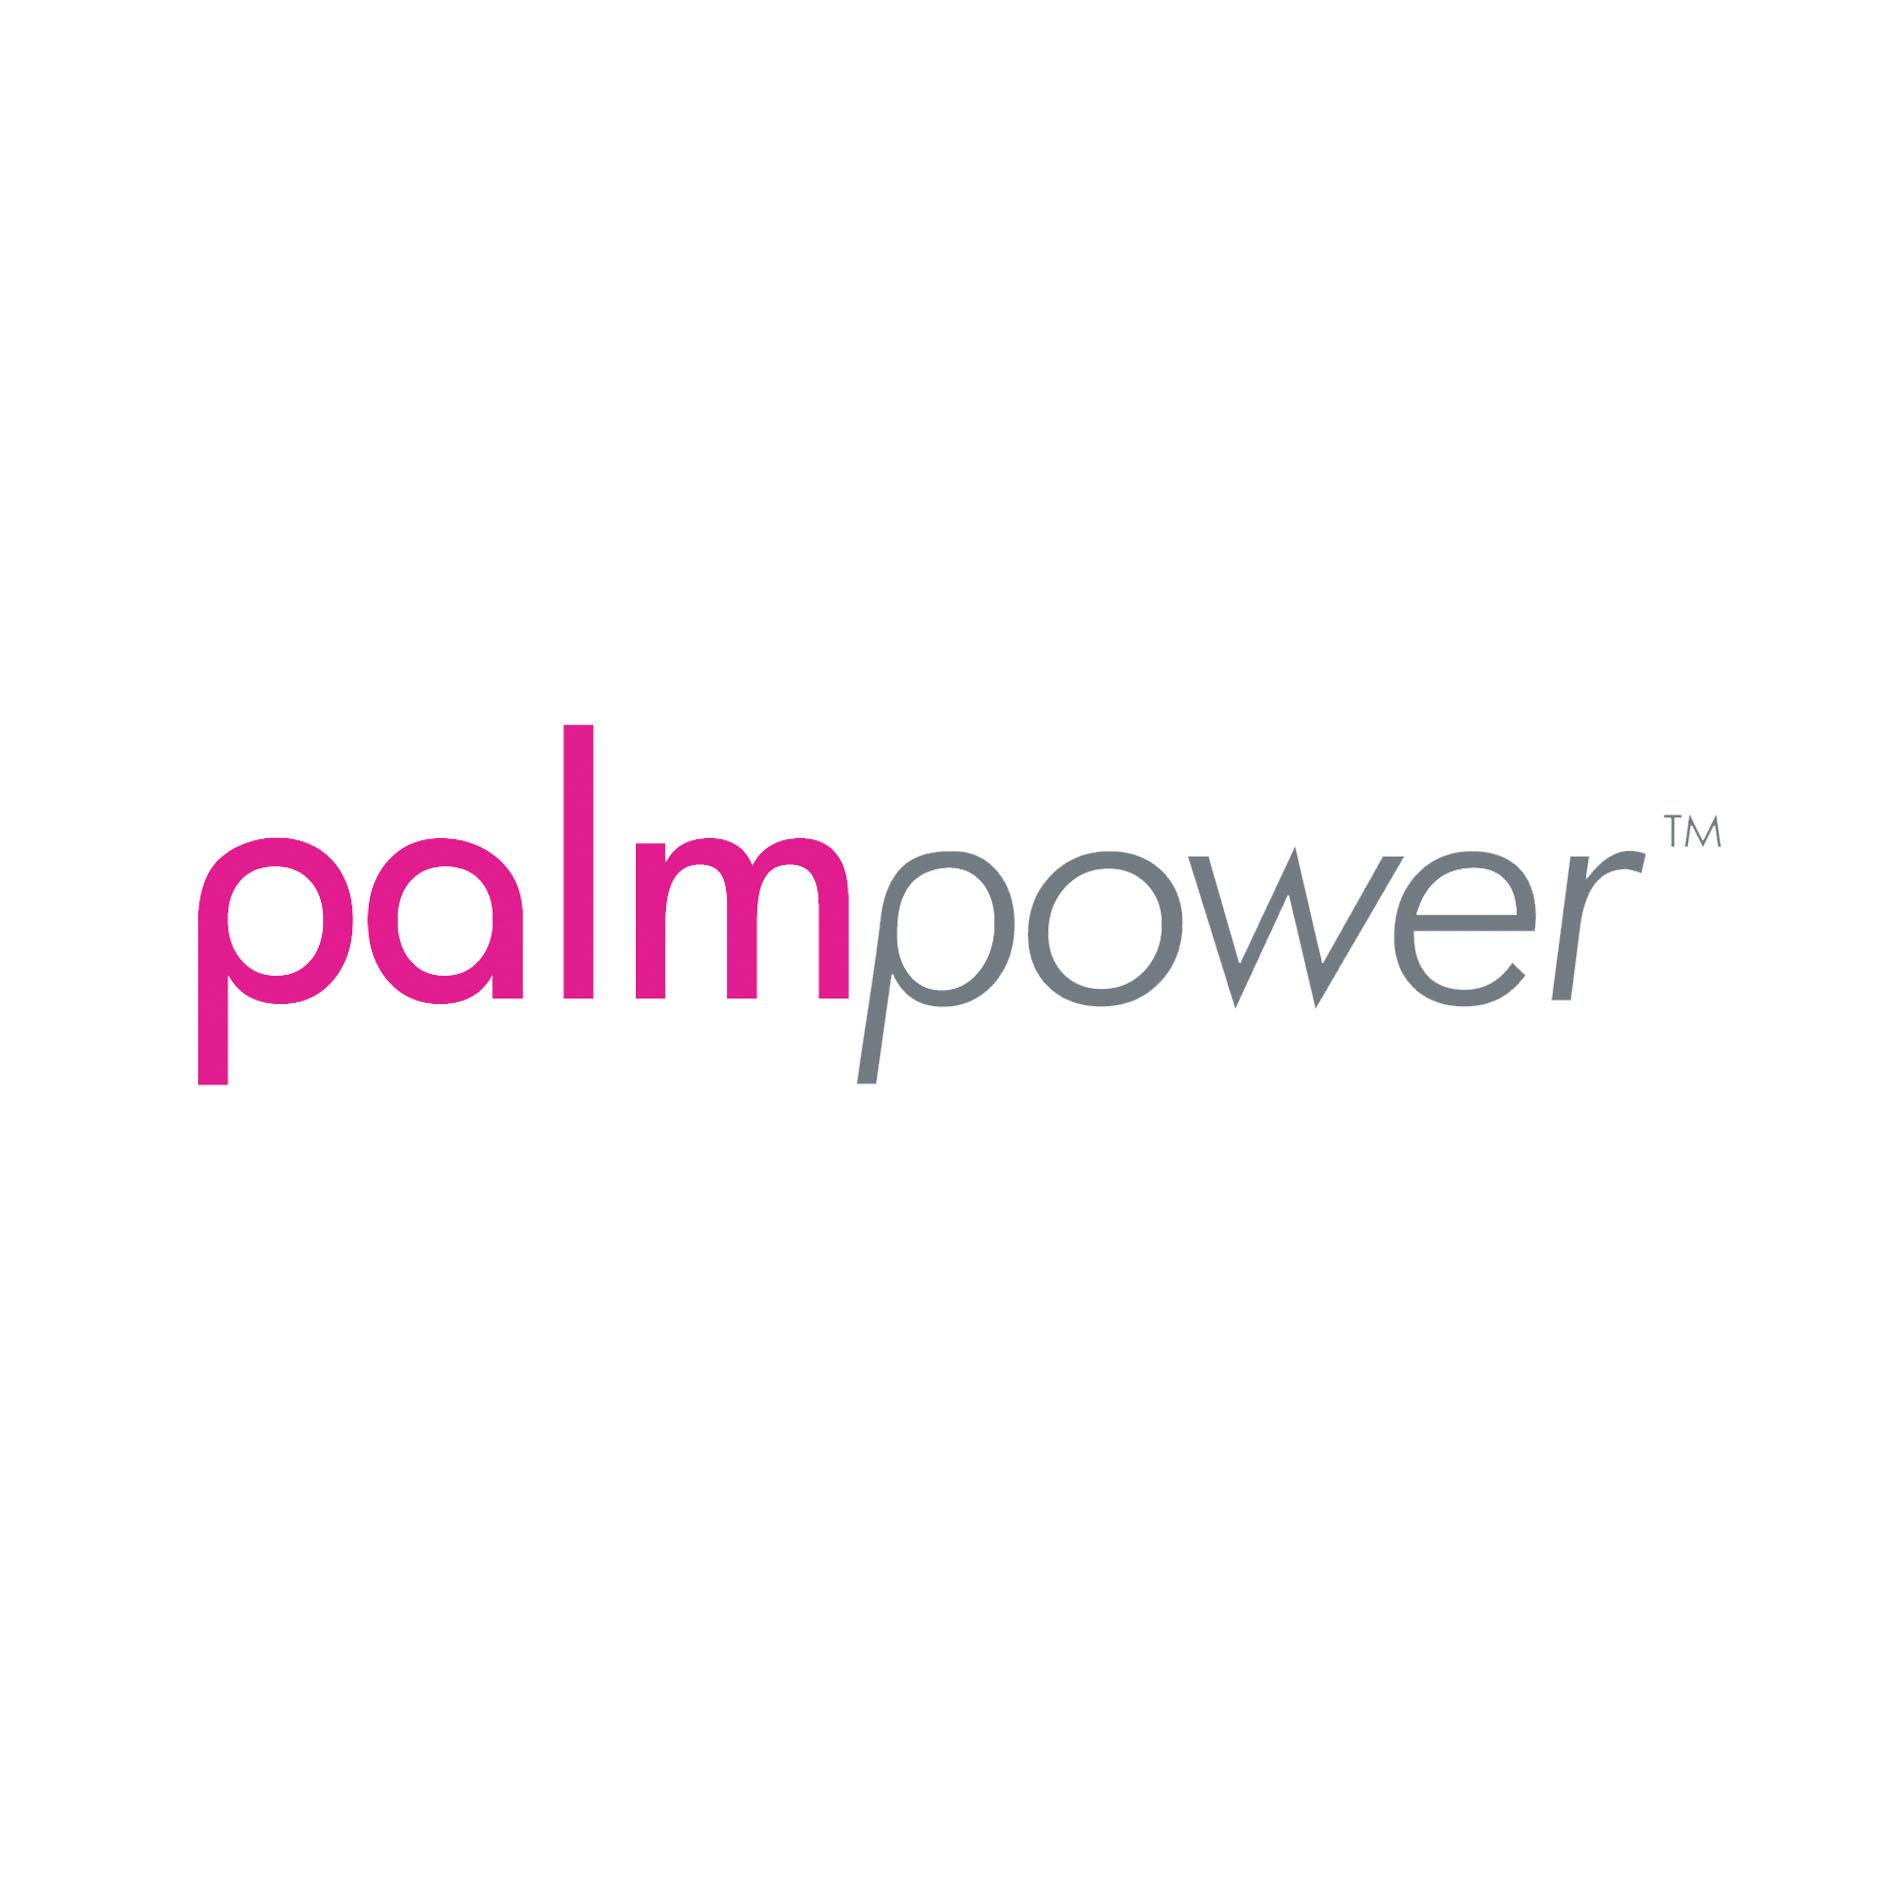 Palm Power